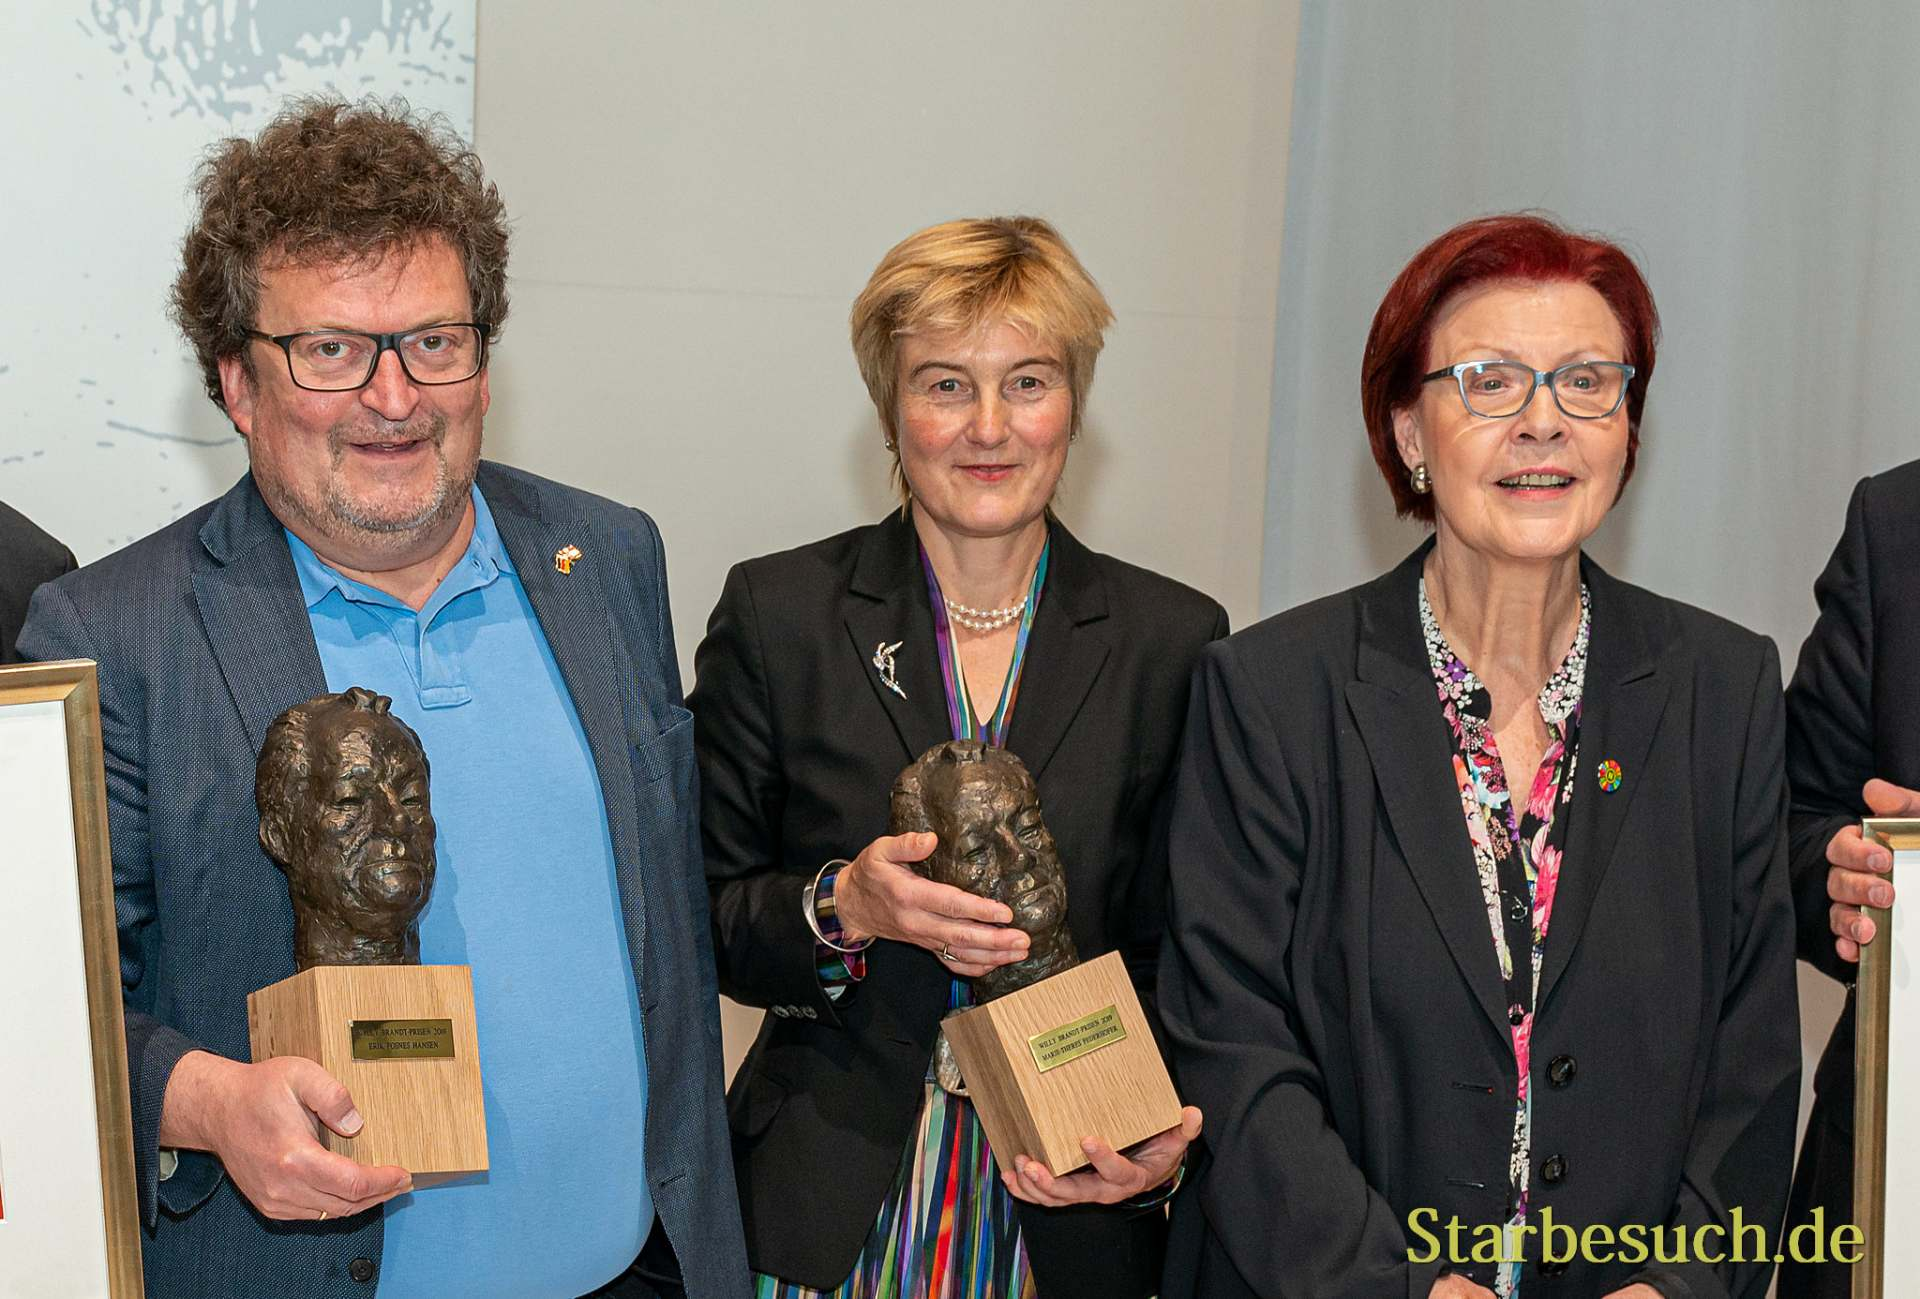 Erik Fosnes Hansen, Marie-Theres Federhofer und Heidemarie Wieczorek-Zeul